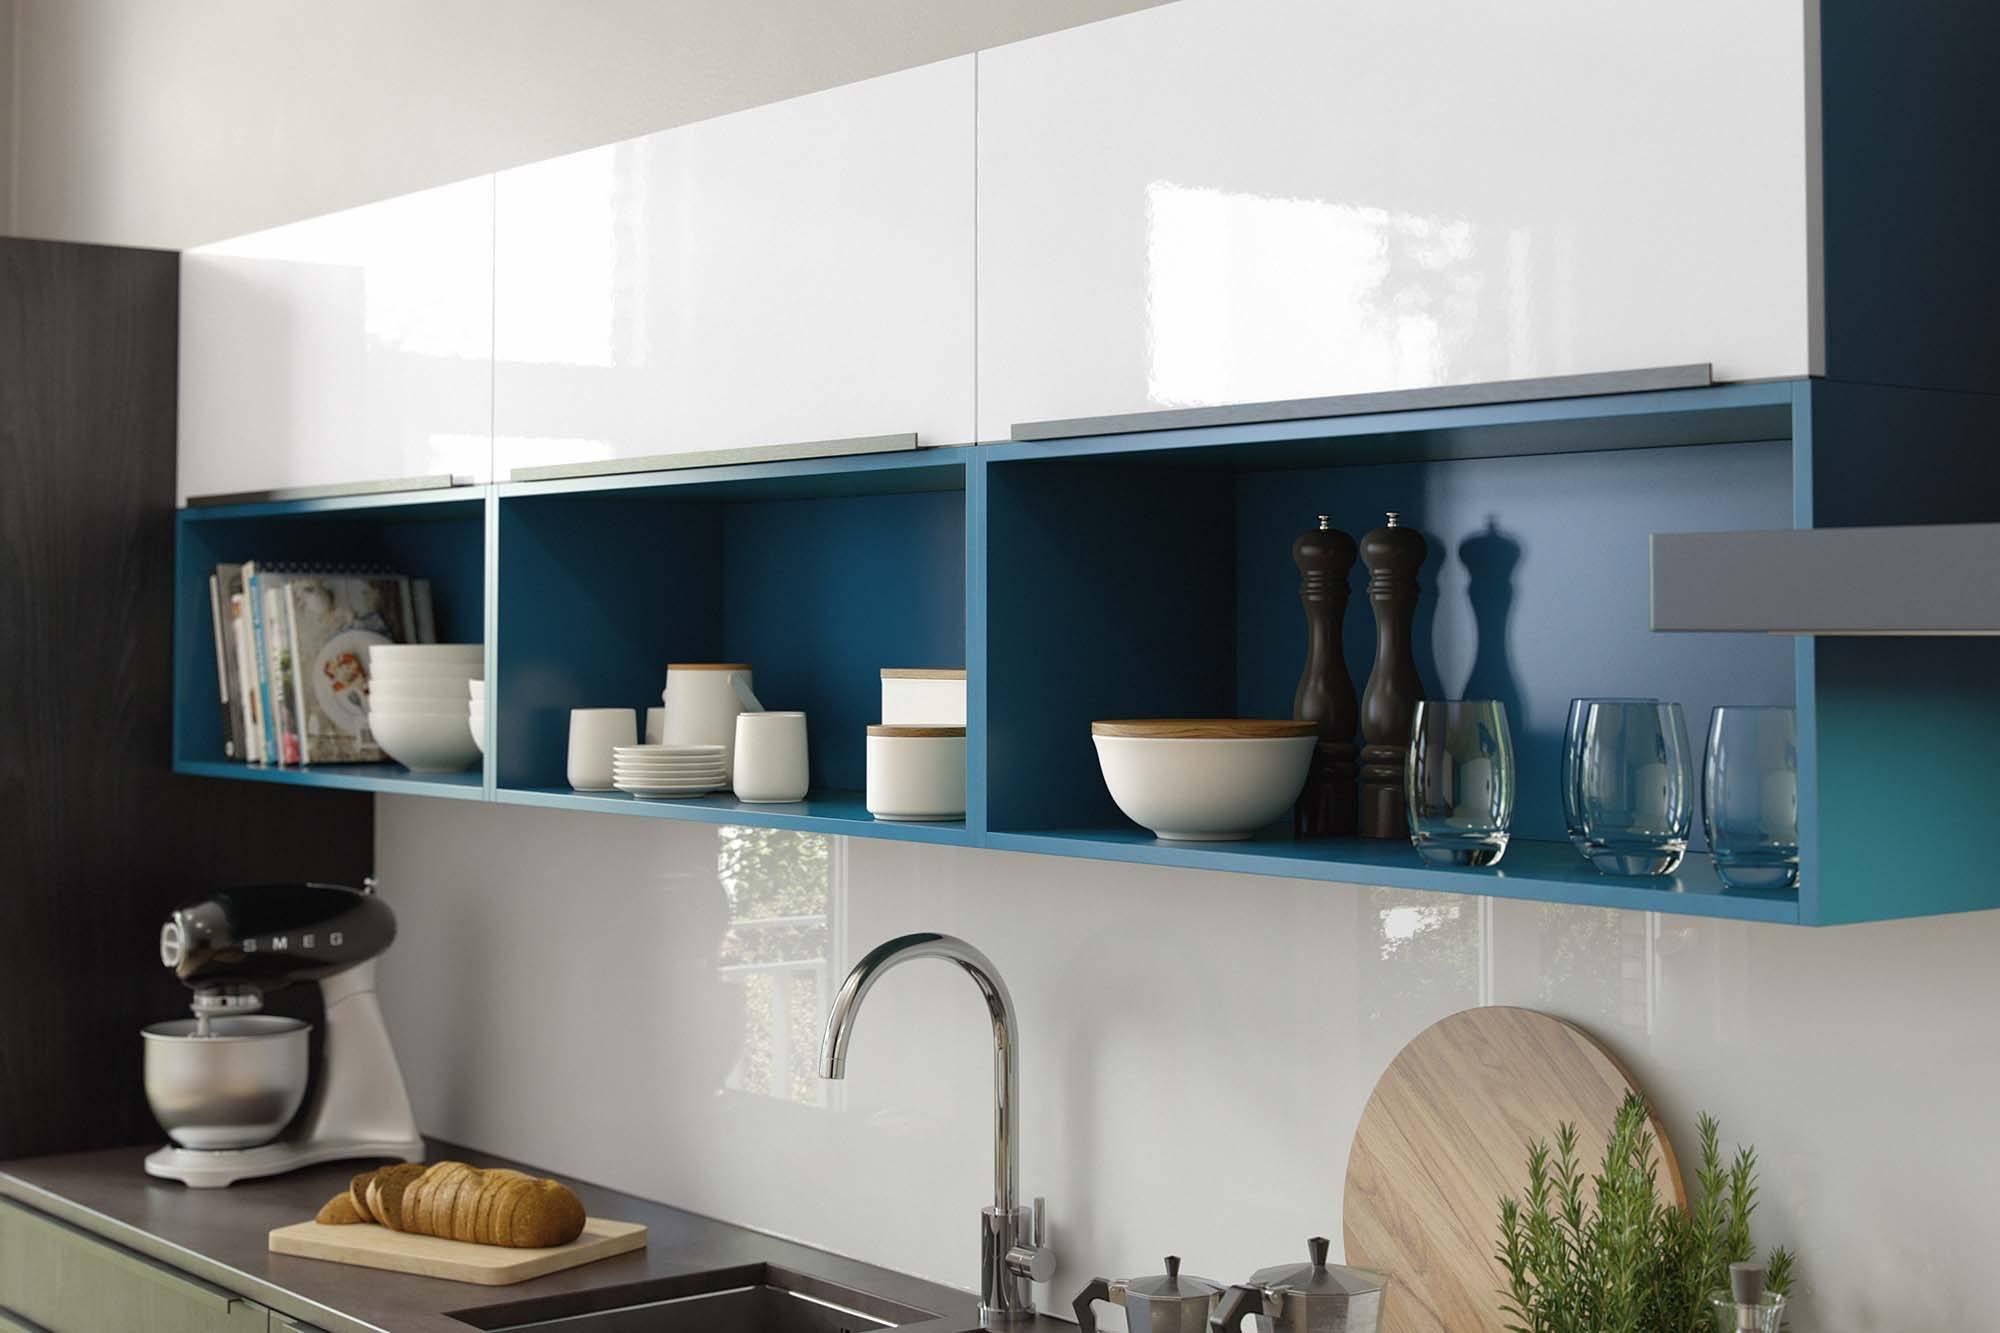 mxv-linear-kitchen-modern-2